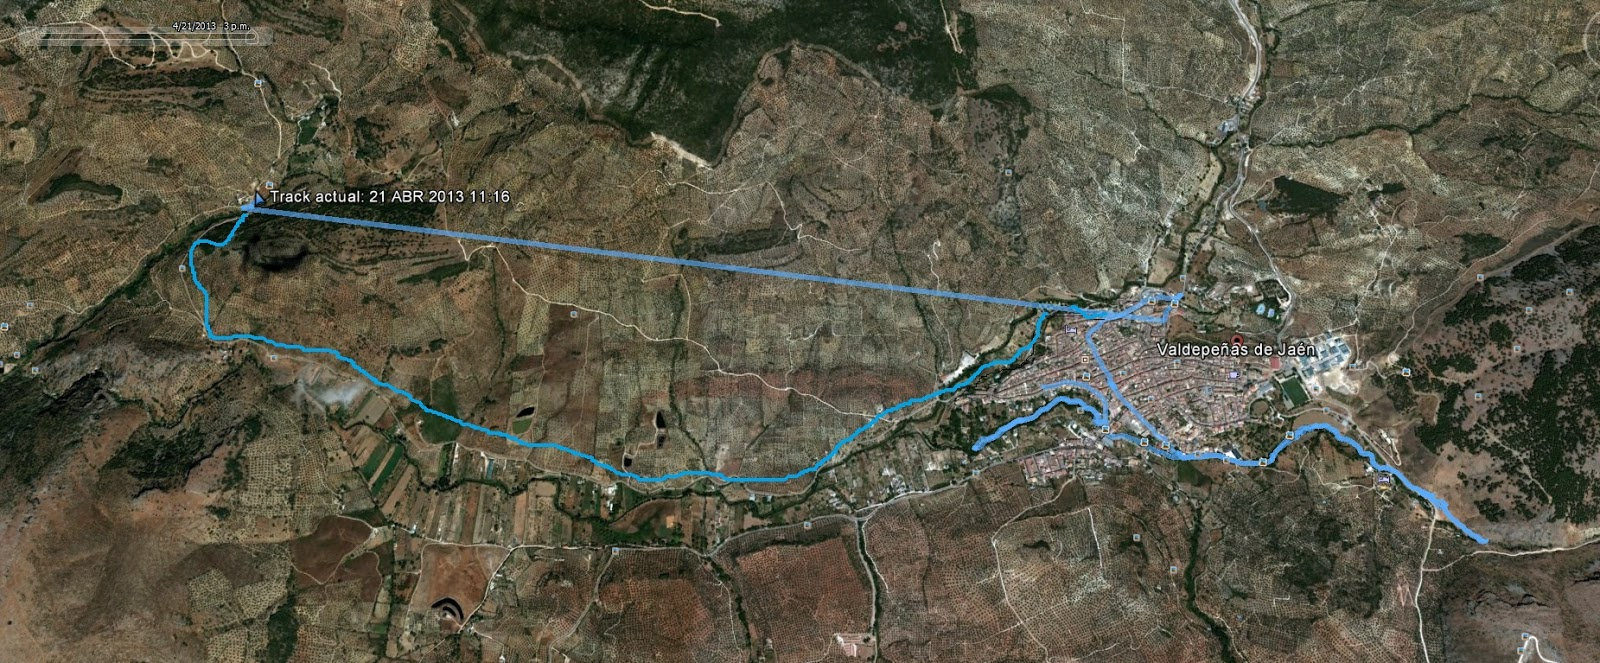 Grupo senderista palme o 130421 convivencia senderista - Plano de valdepenas ...